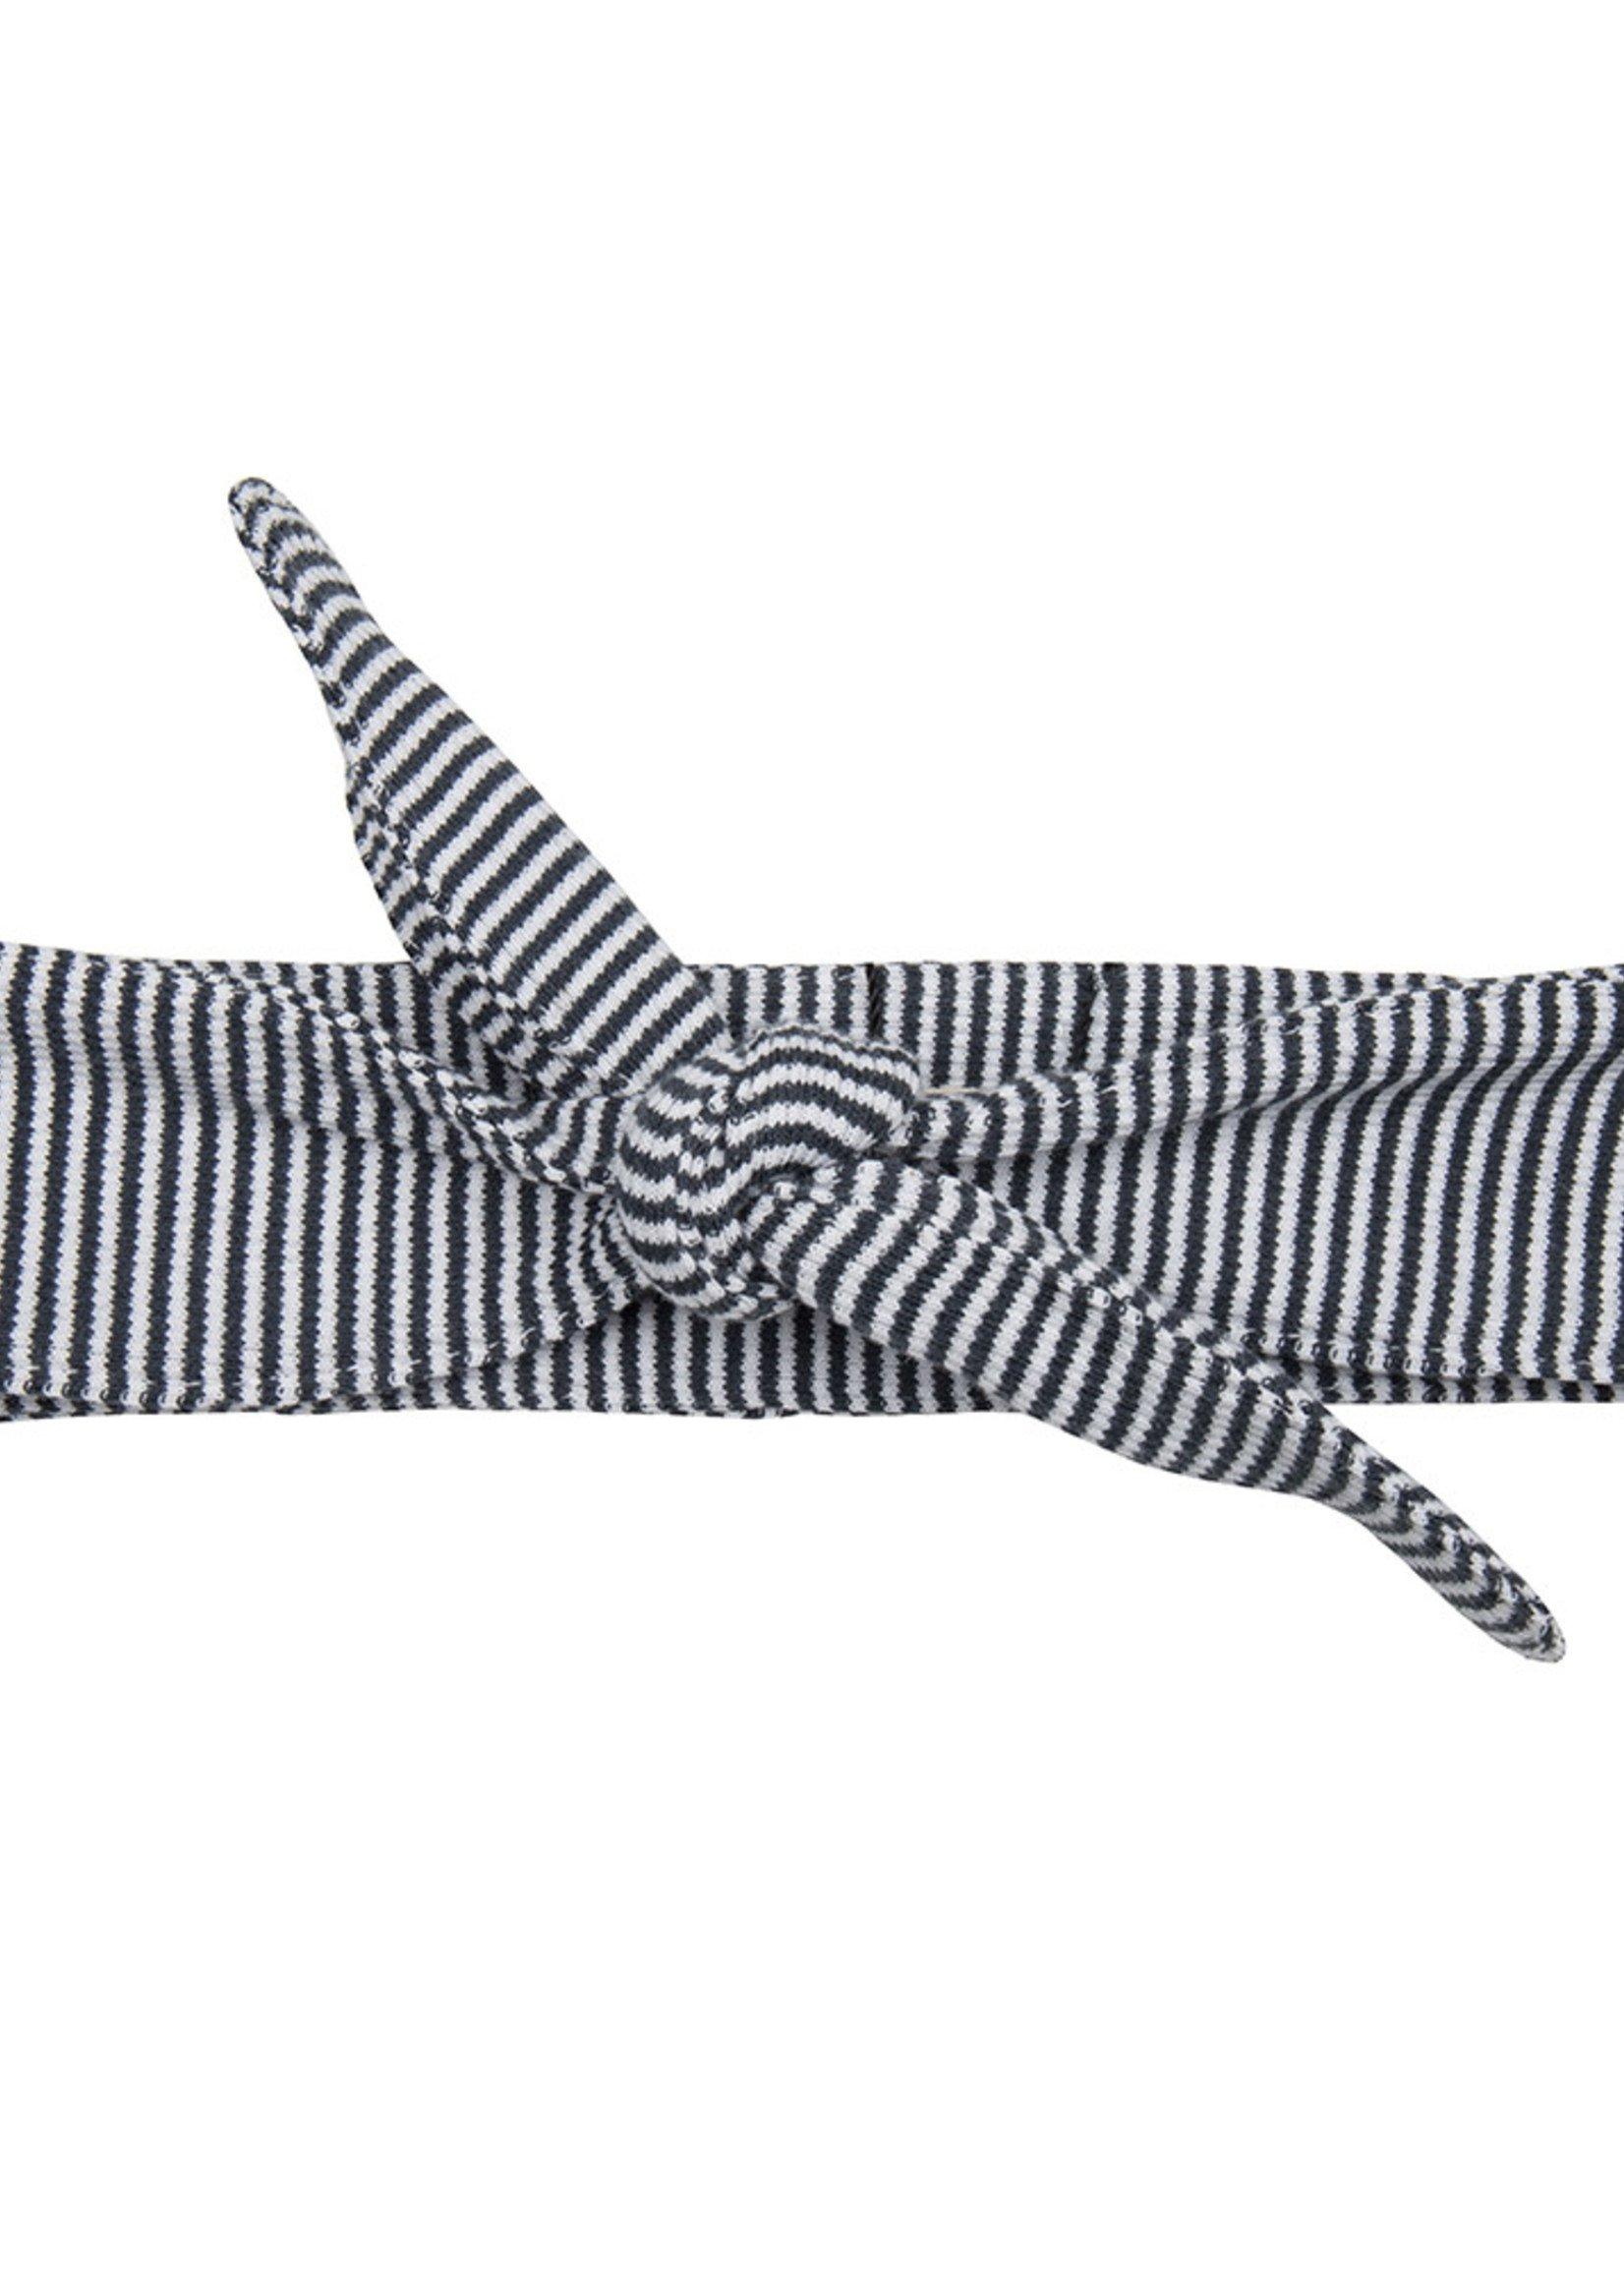 Little Indians Headband - Small Stripe Rib Maat: One Size